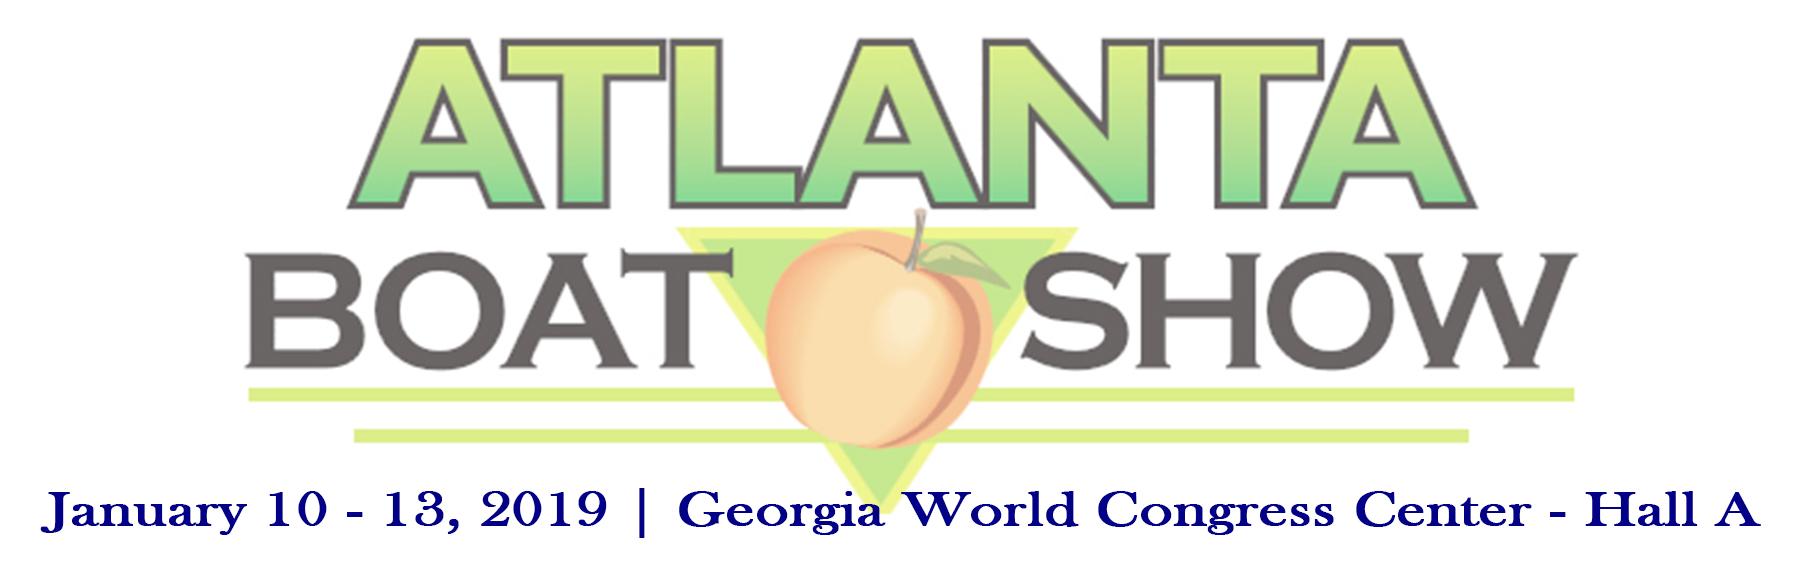 2019 Atlanta Boat Show